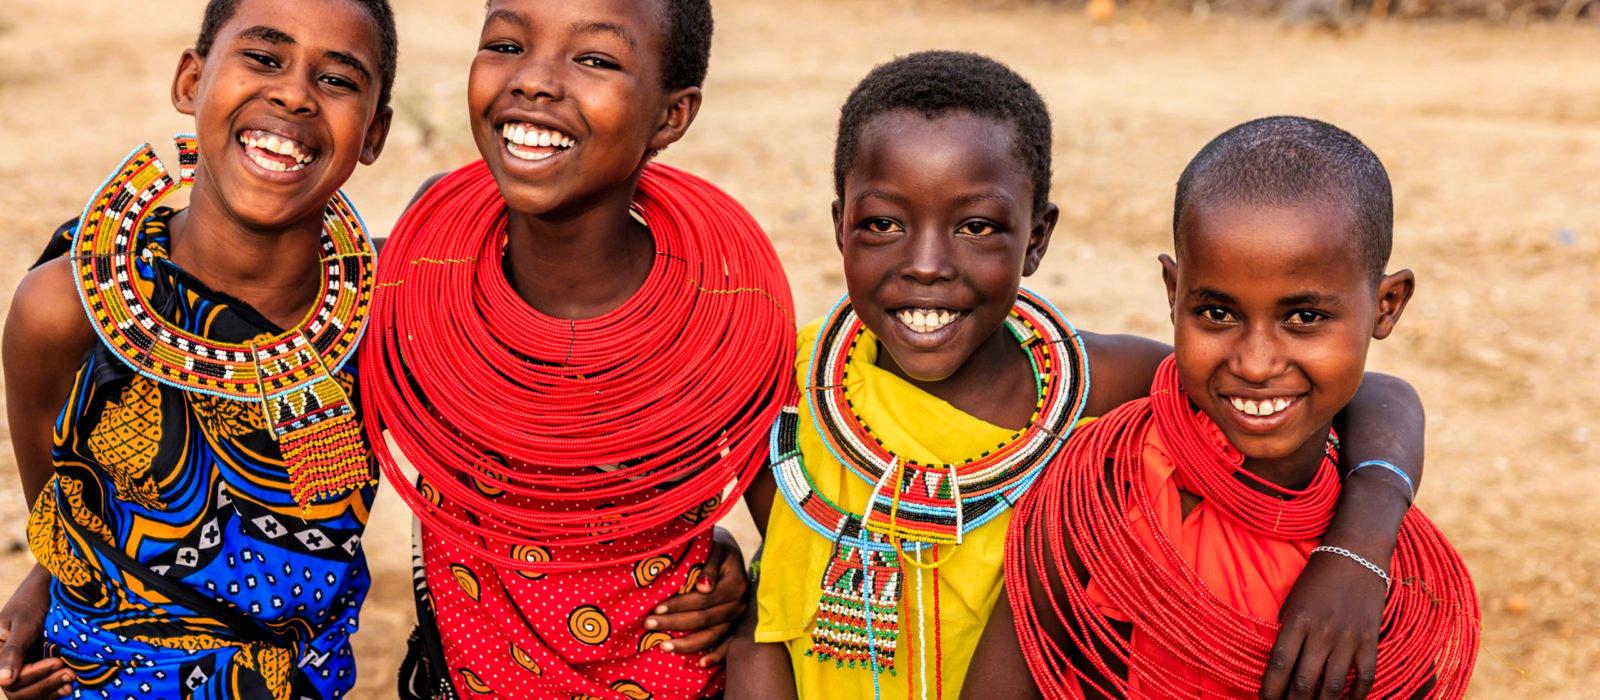 Group of happy African girls from Samburu tribe, Kenya, Africa